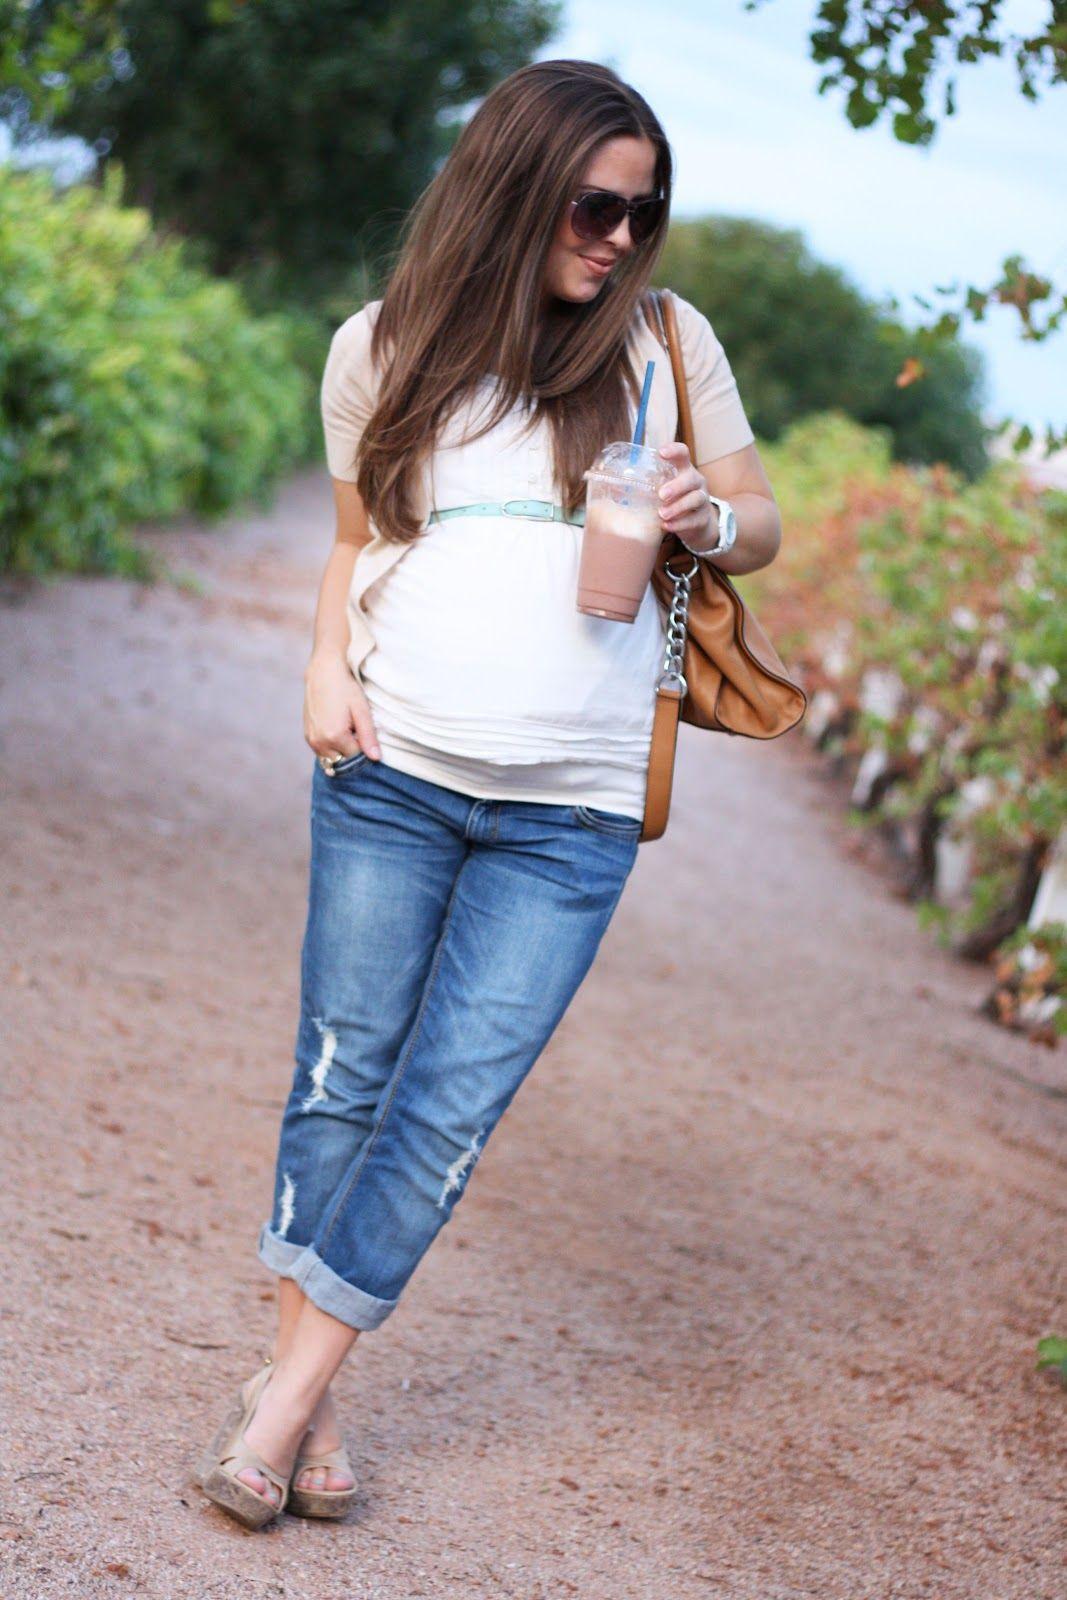 1afb041ca6b95 Joe's Farm Grill | *Maternity Fashion* | Maternity fashion, Cute ...